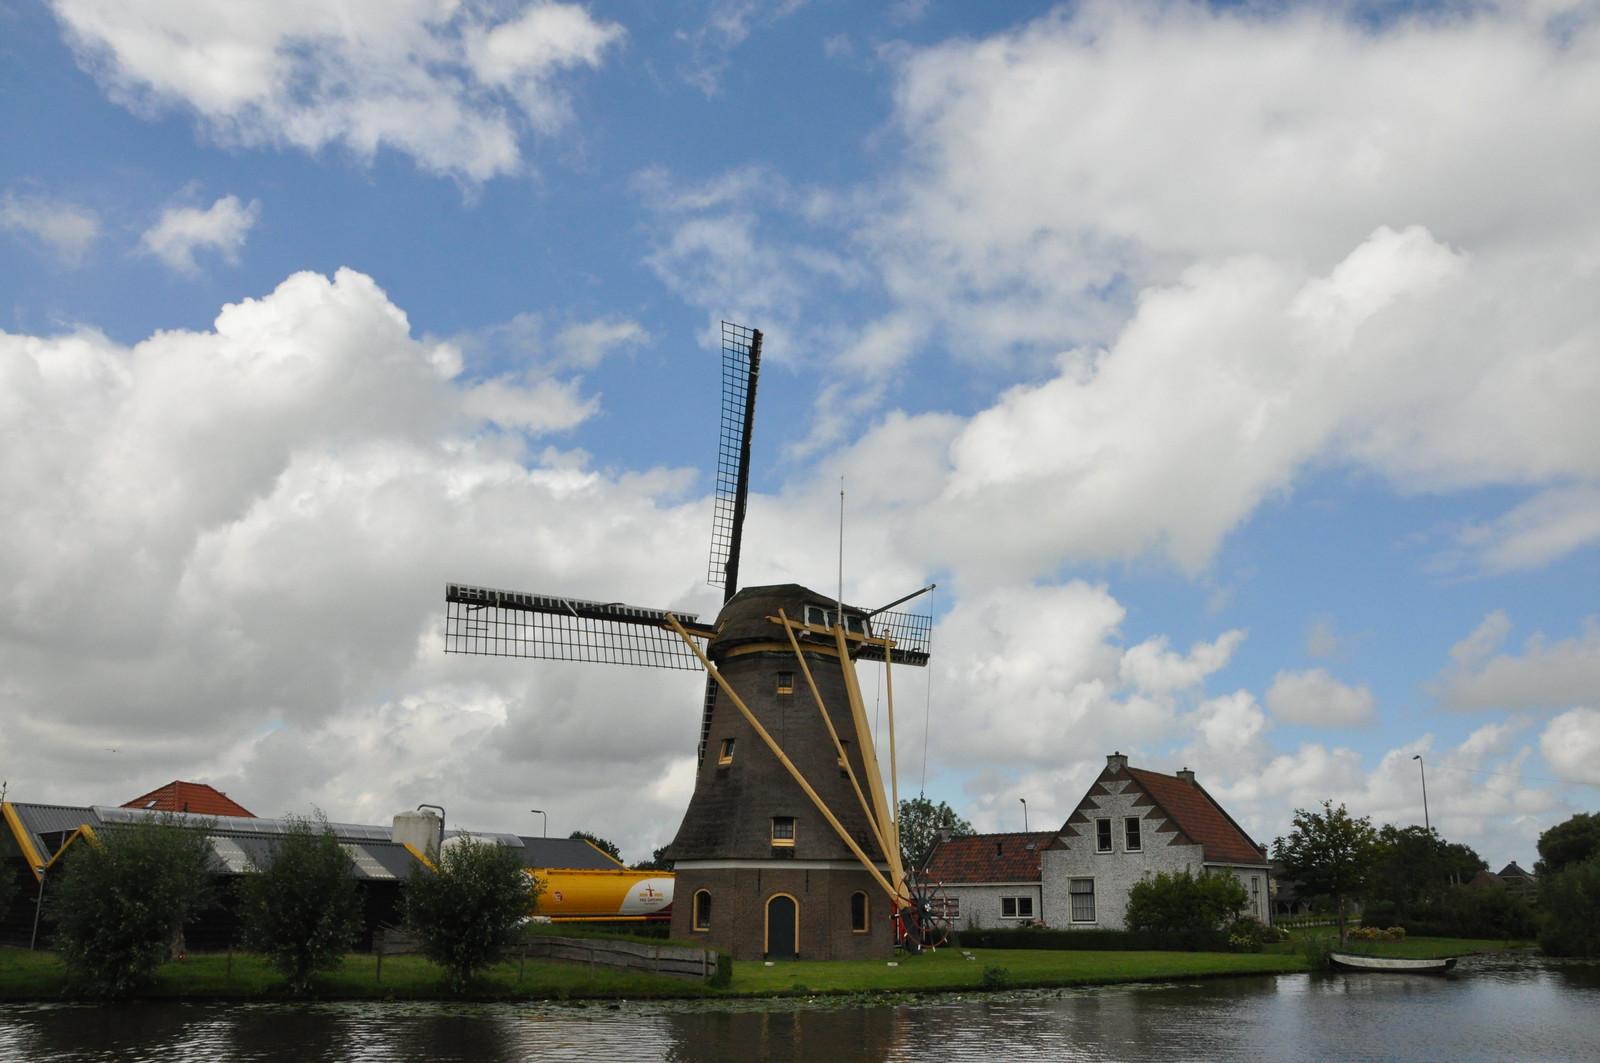 Opdracht_5_MERIJN_OUKES - Merijn Oukes